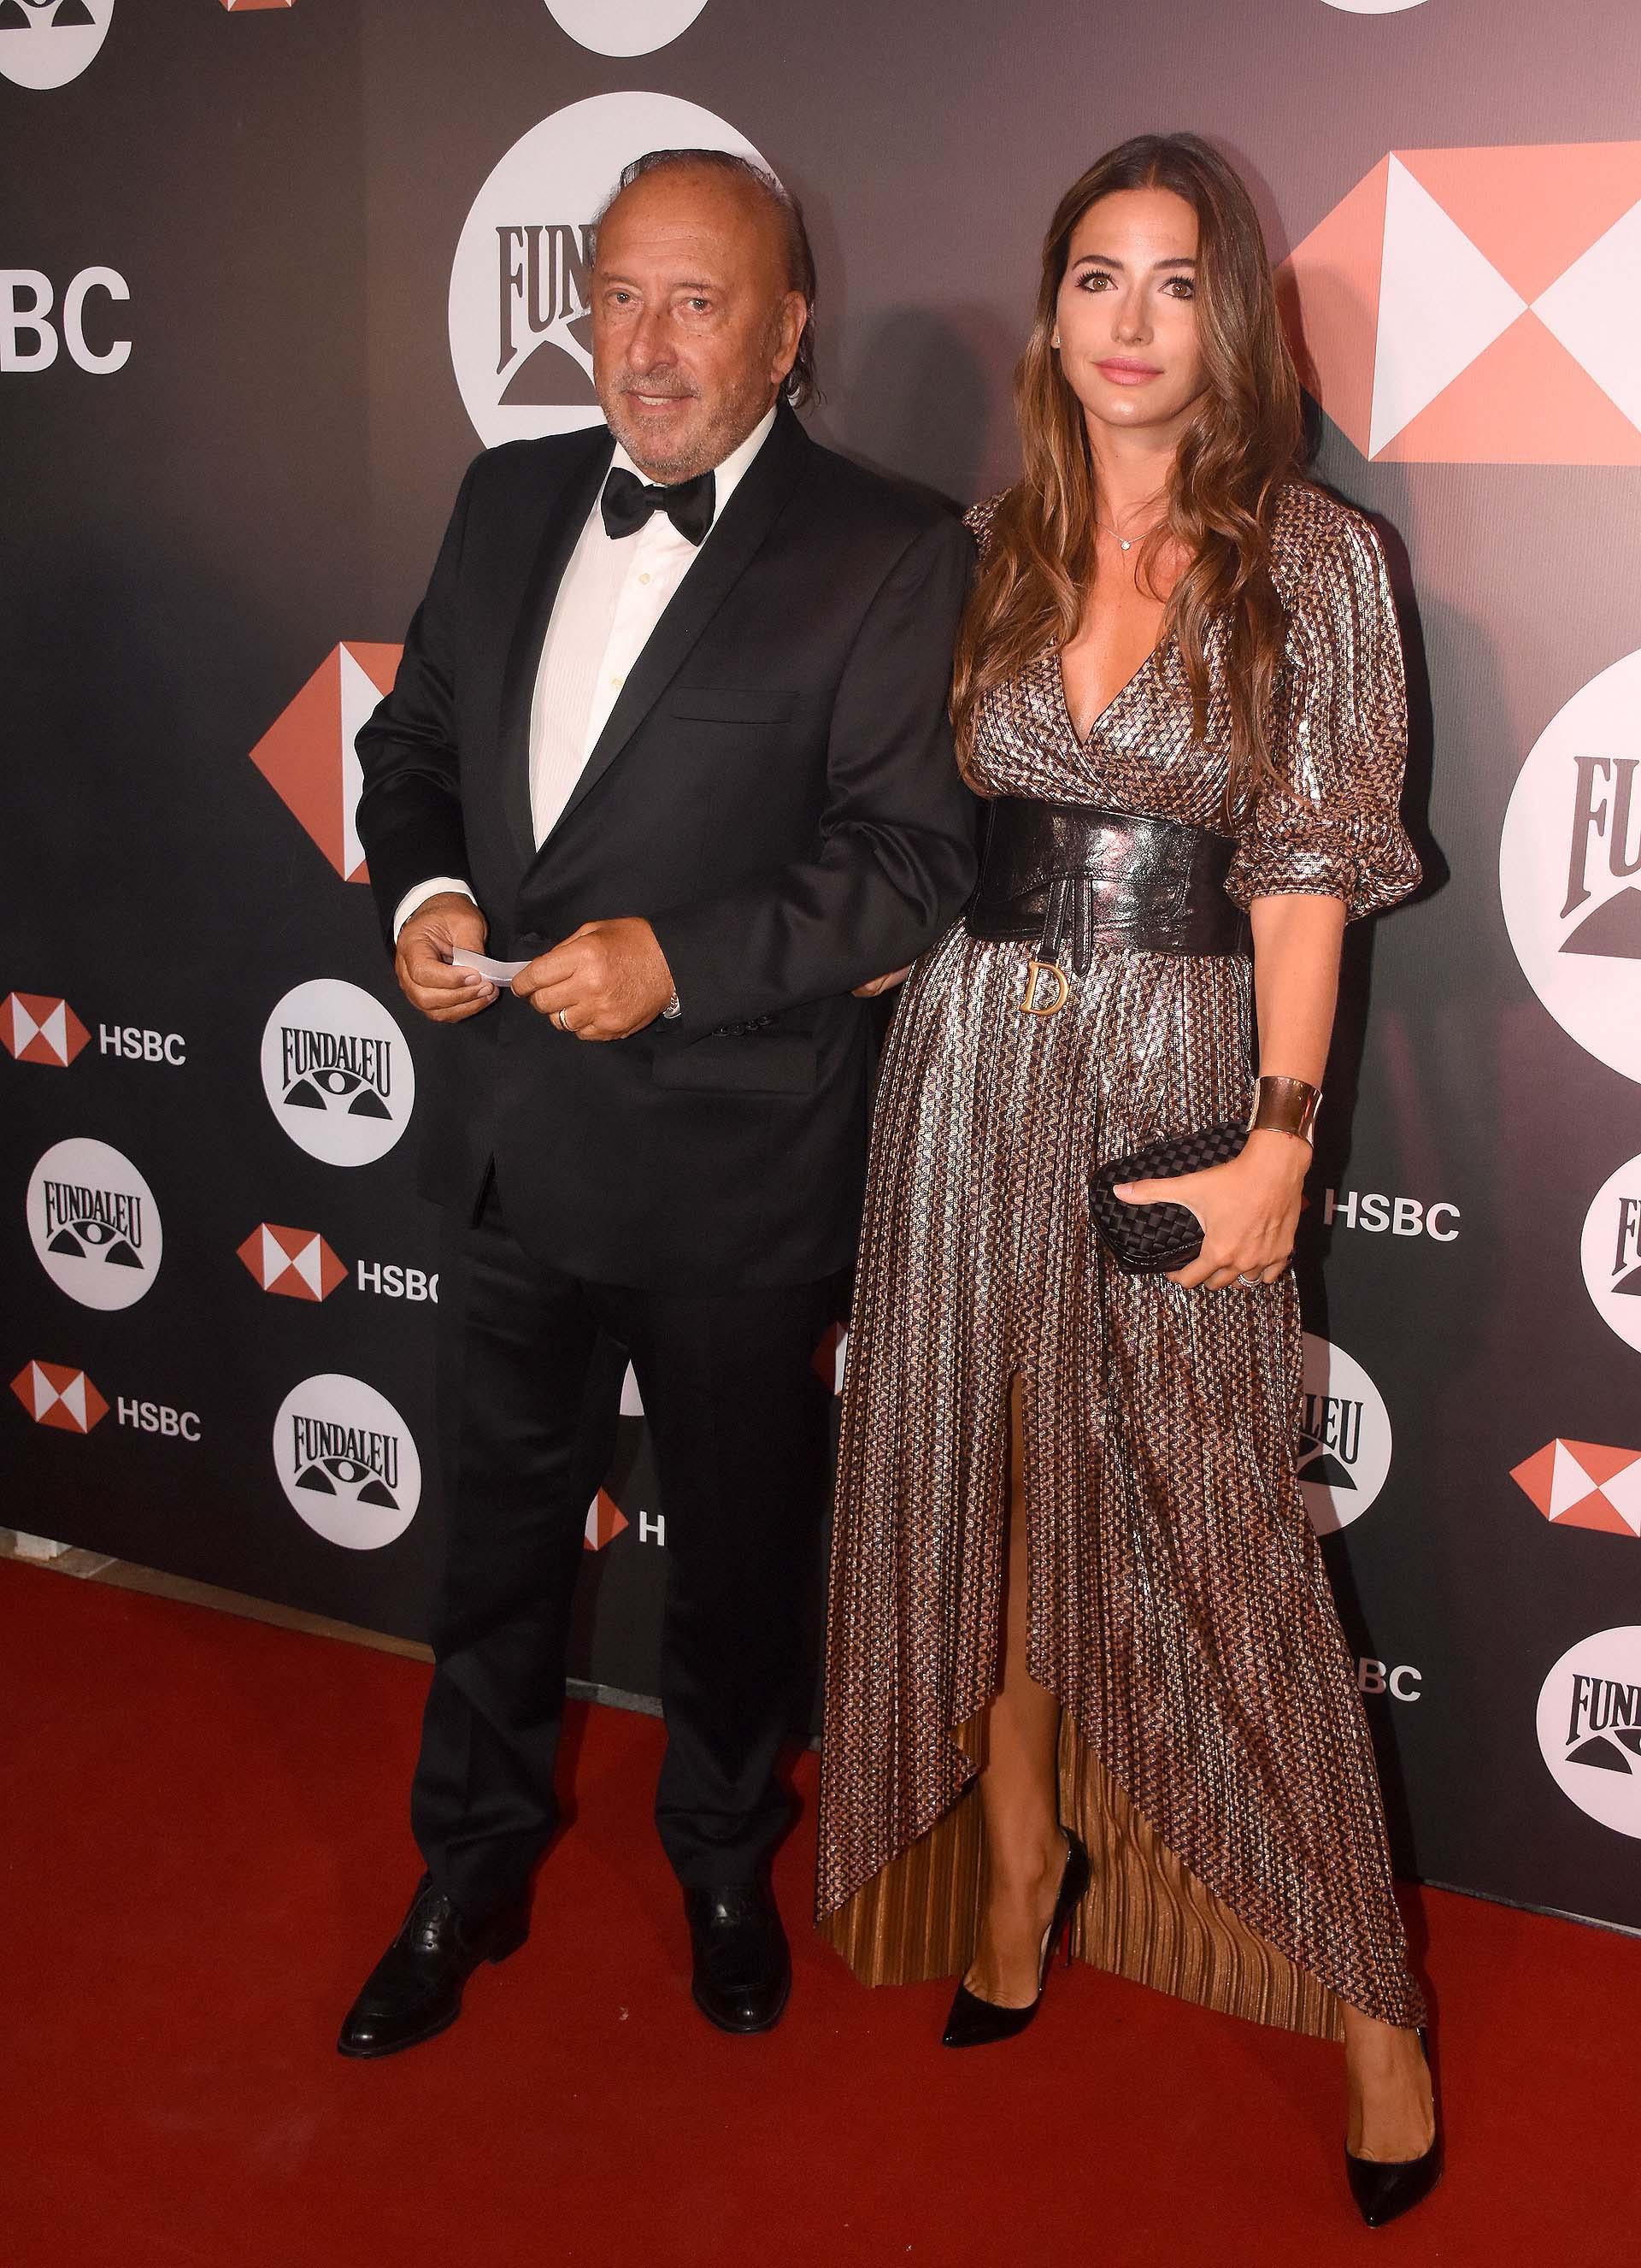 Mauricio Filiberti, dueño de Transclor, y su mujer Camila Pitana